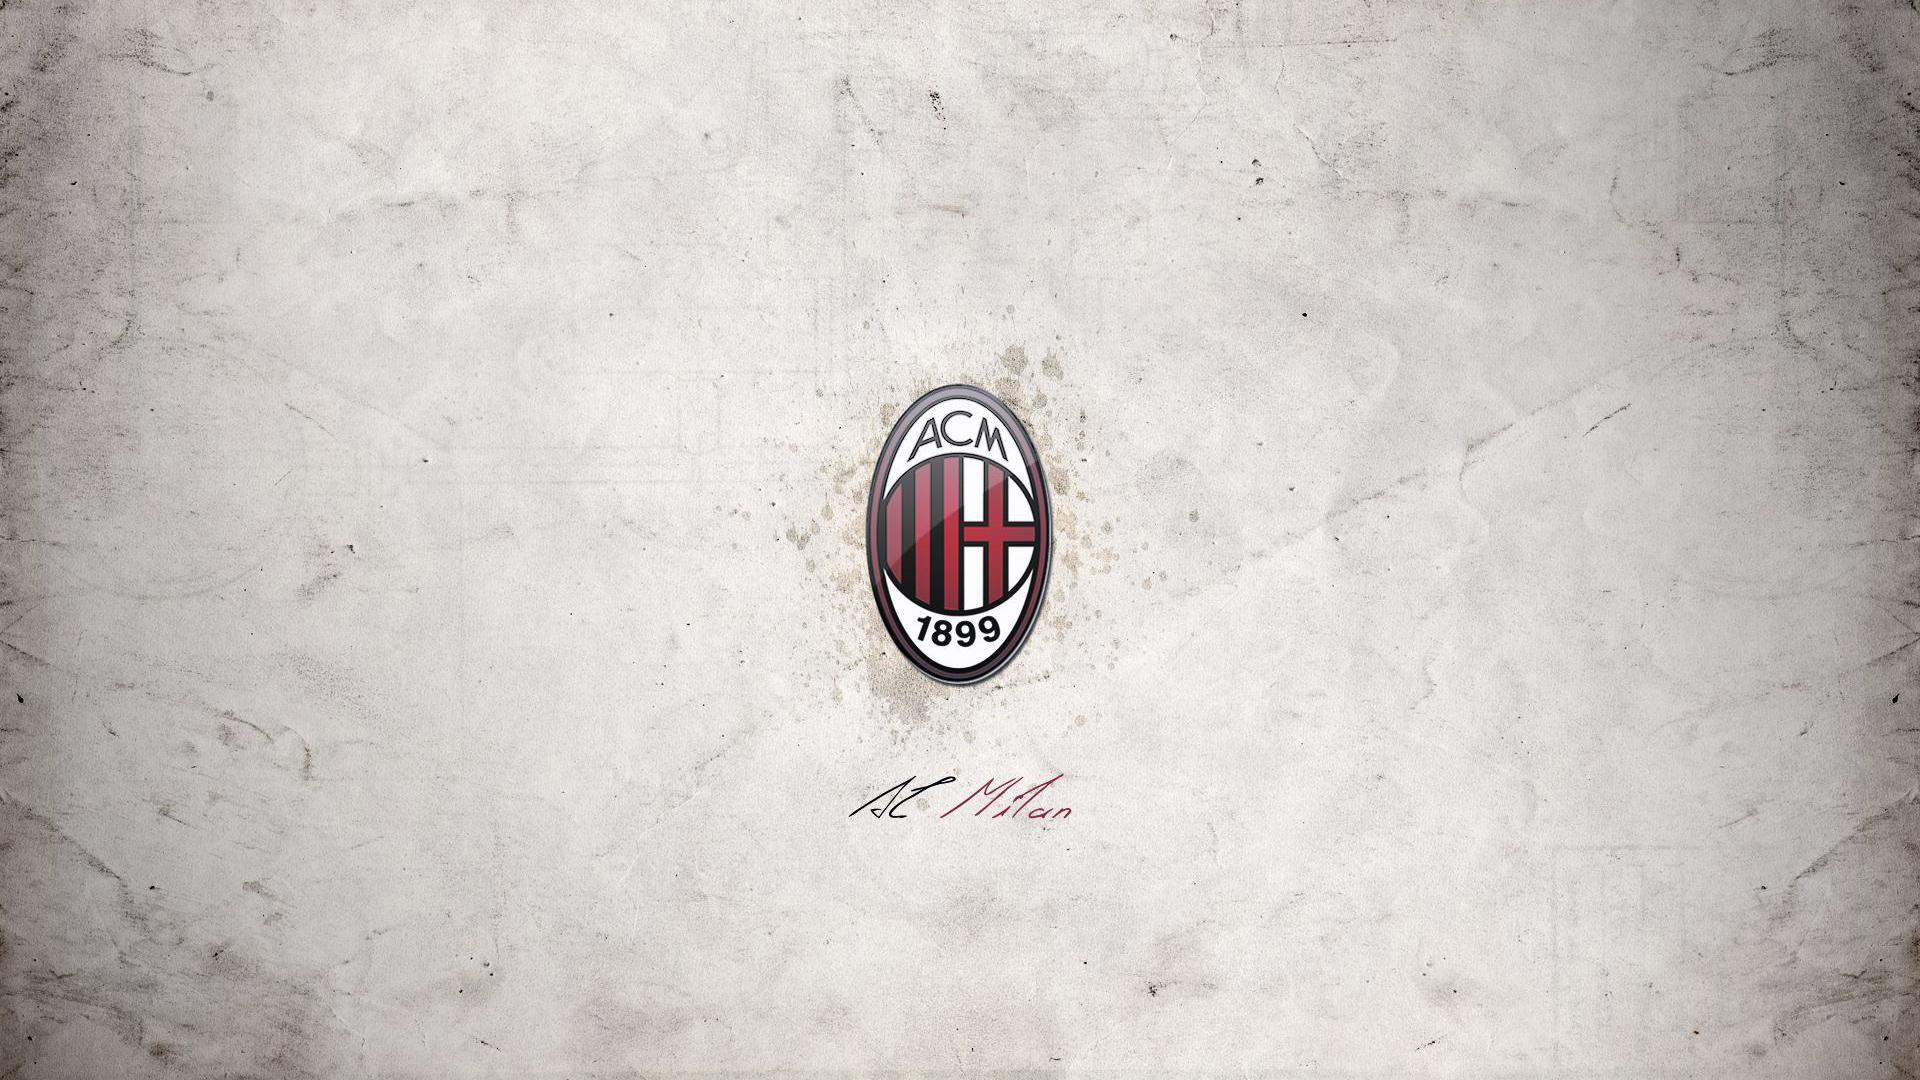 Ac Milan Best Club Hd Image